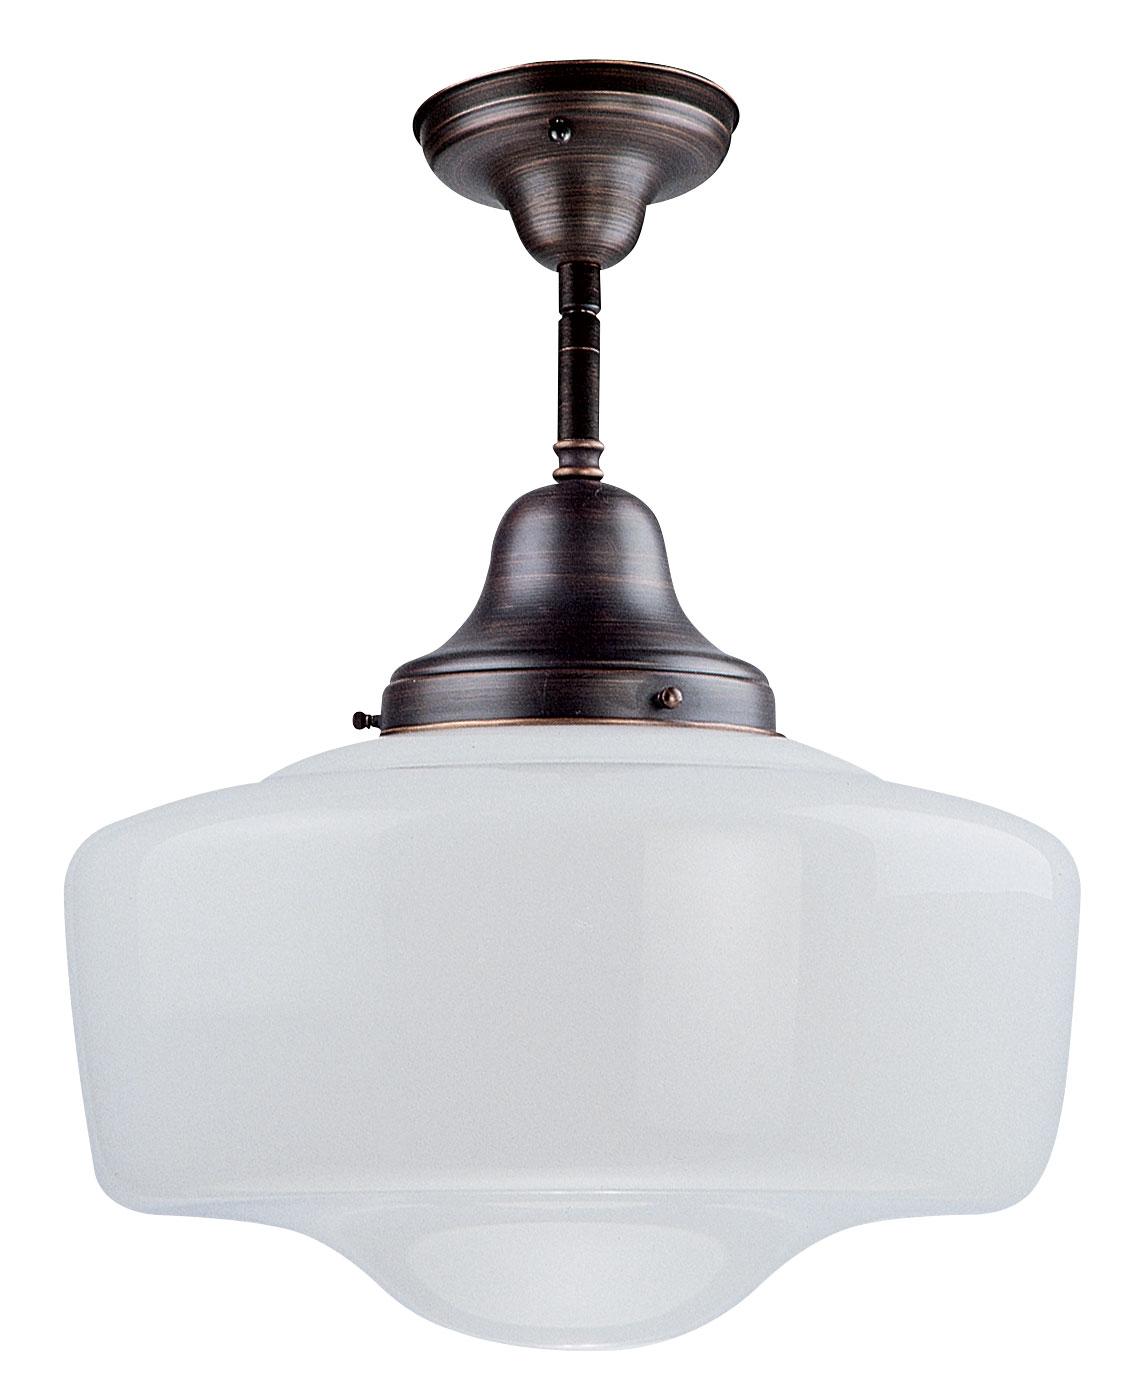 Schoolhouse Pendant Track Lighting: Schoolhouse Ceiling Semi Flush Mount By DVI Lighting